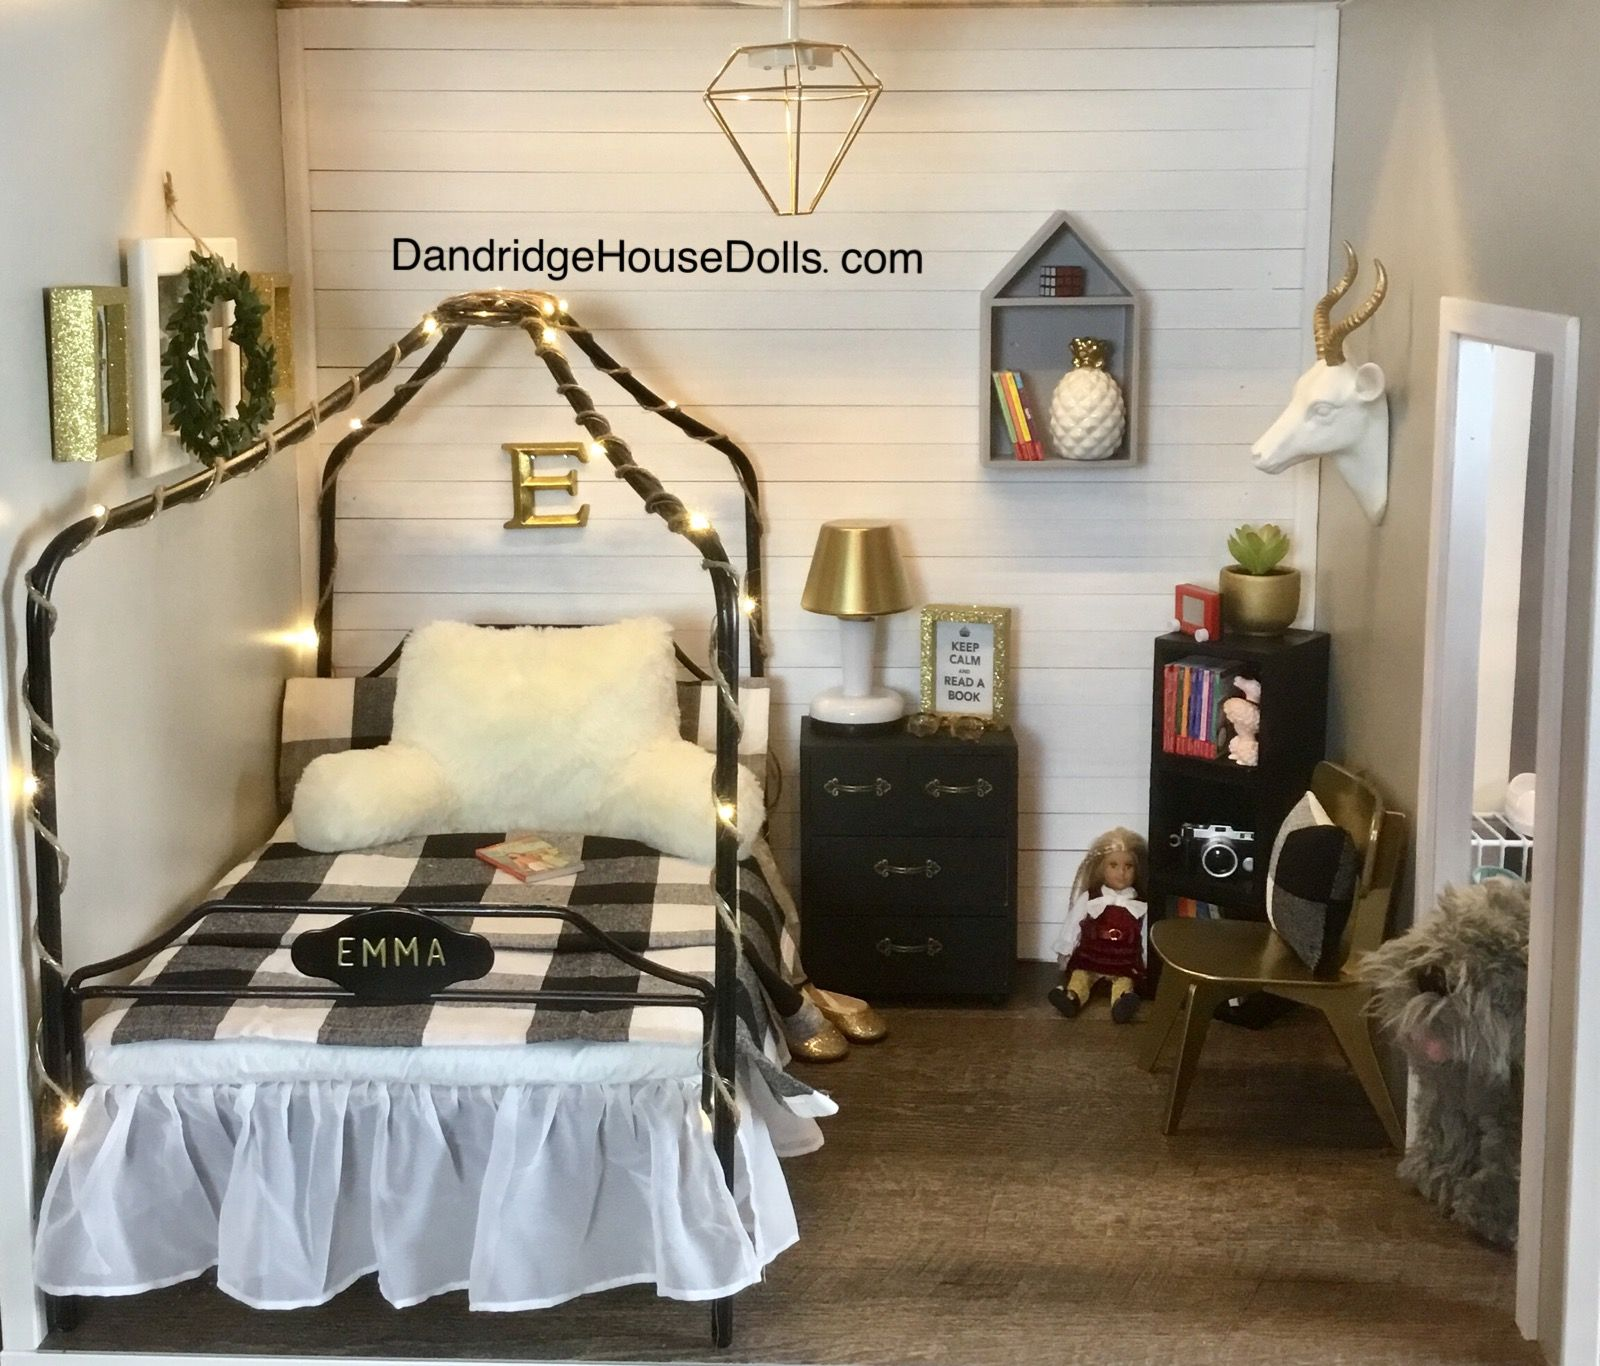 emma's bedroom  american girl doll room american girl